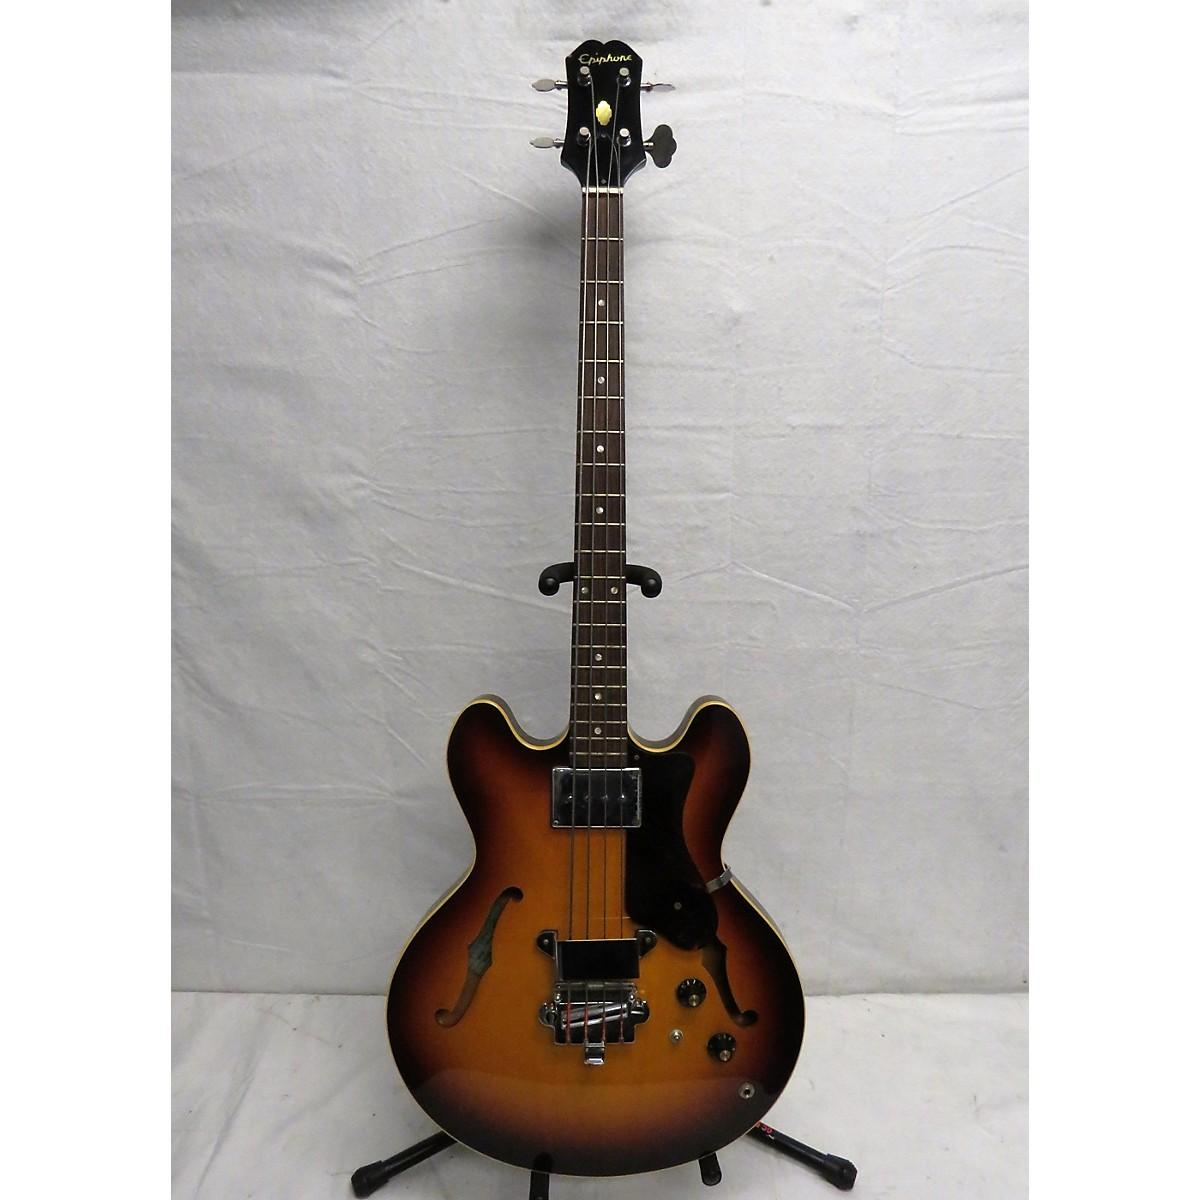 Epiphone 1967 Rivoli EB-232 Electric Bass Guitar